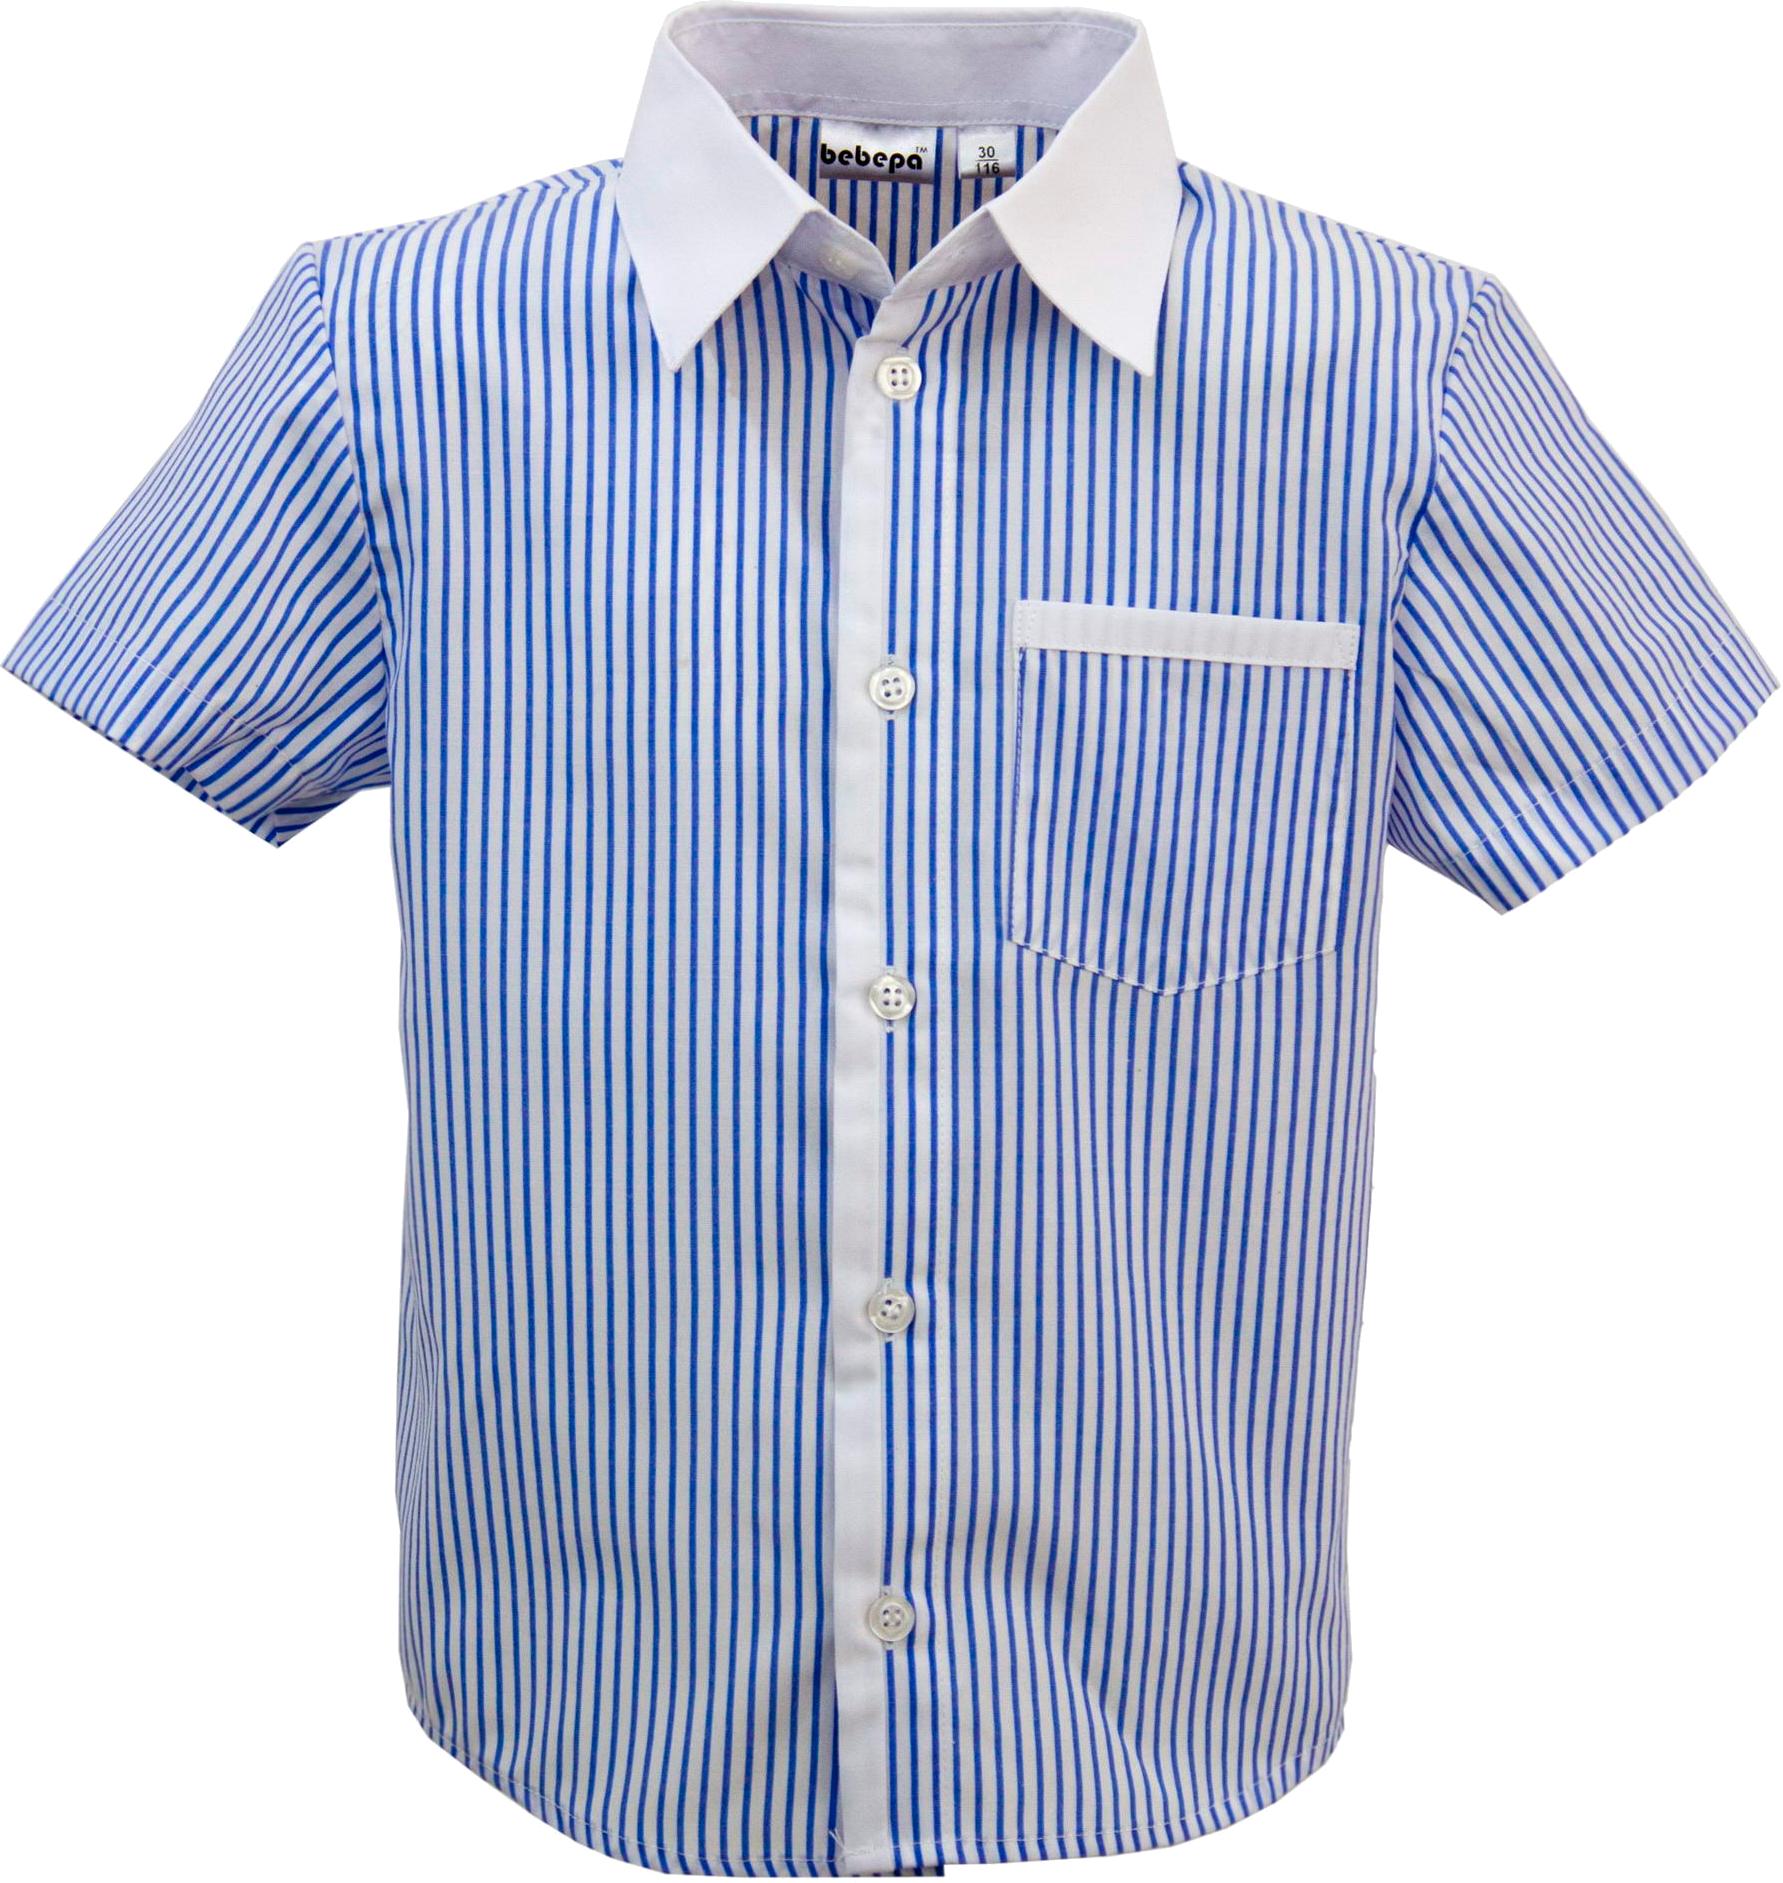 Formal Half Kid Shirt PNG Image